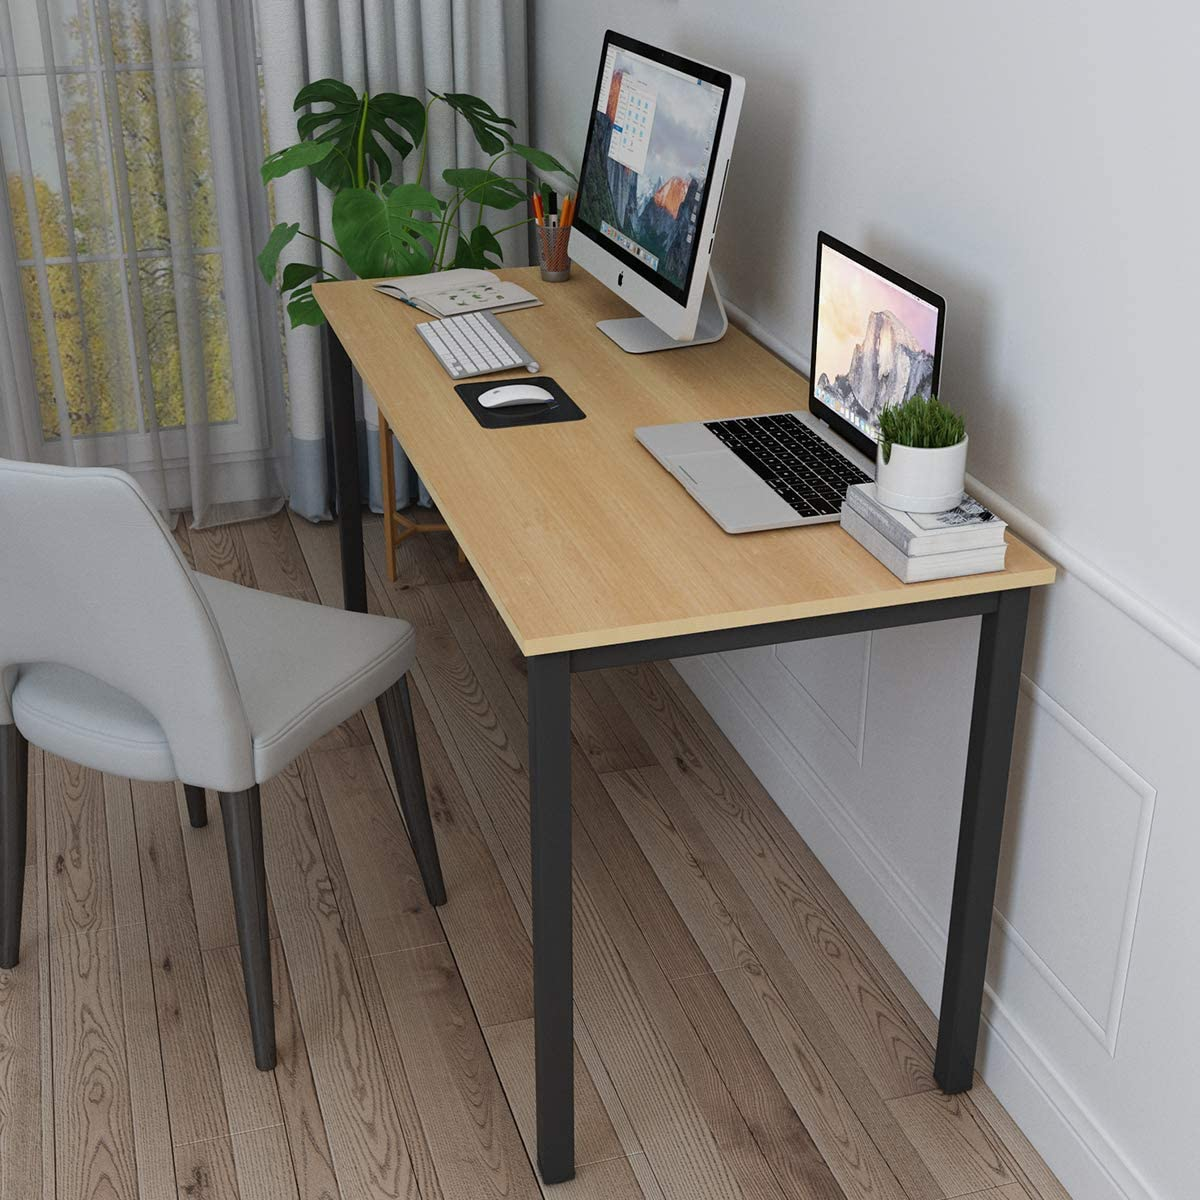 SogesHome Computer Desk 63 inches Large Desk Writing Desk with BIFMA Certification Workstation Office Desk,NSDUS-GCP2AC3-160OA